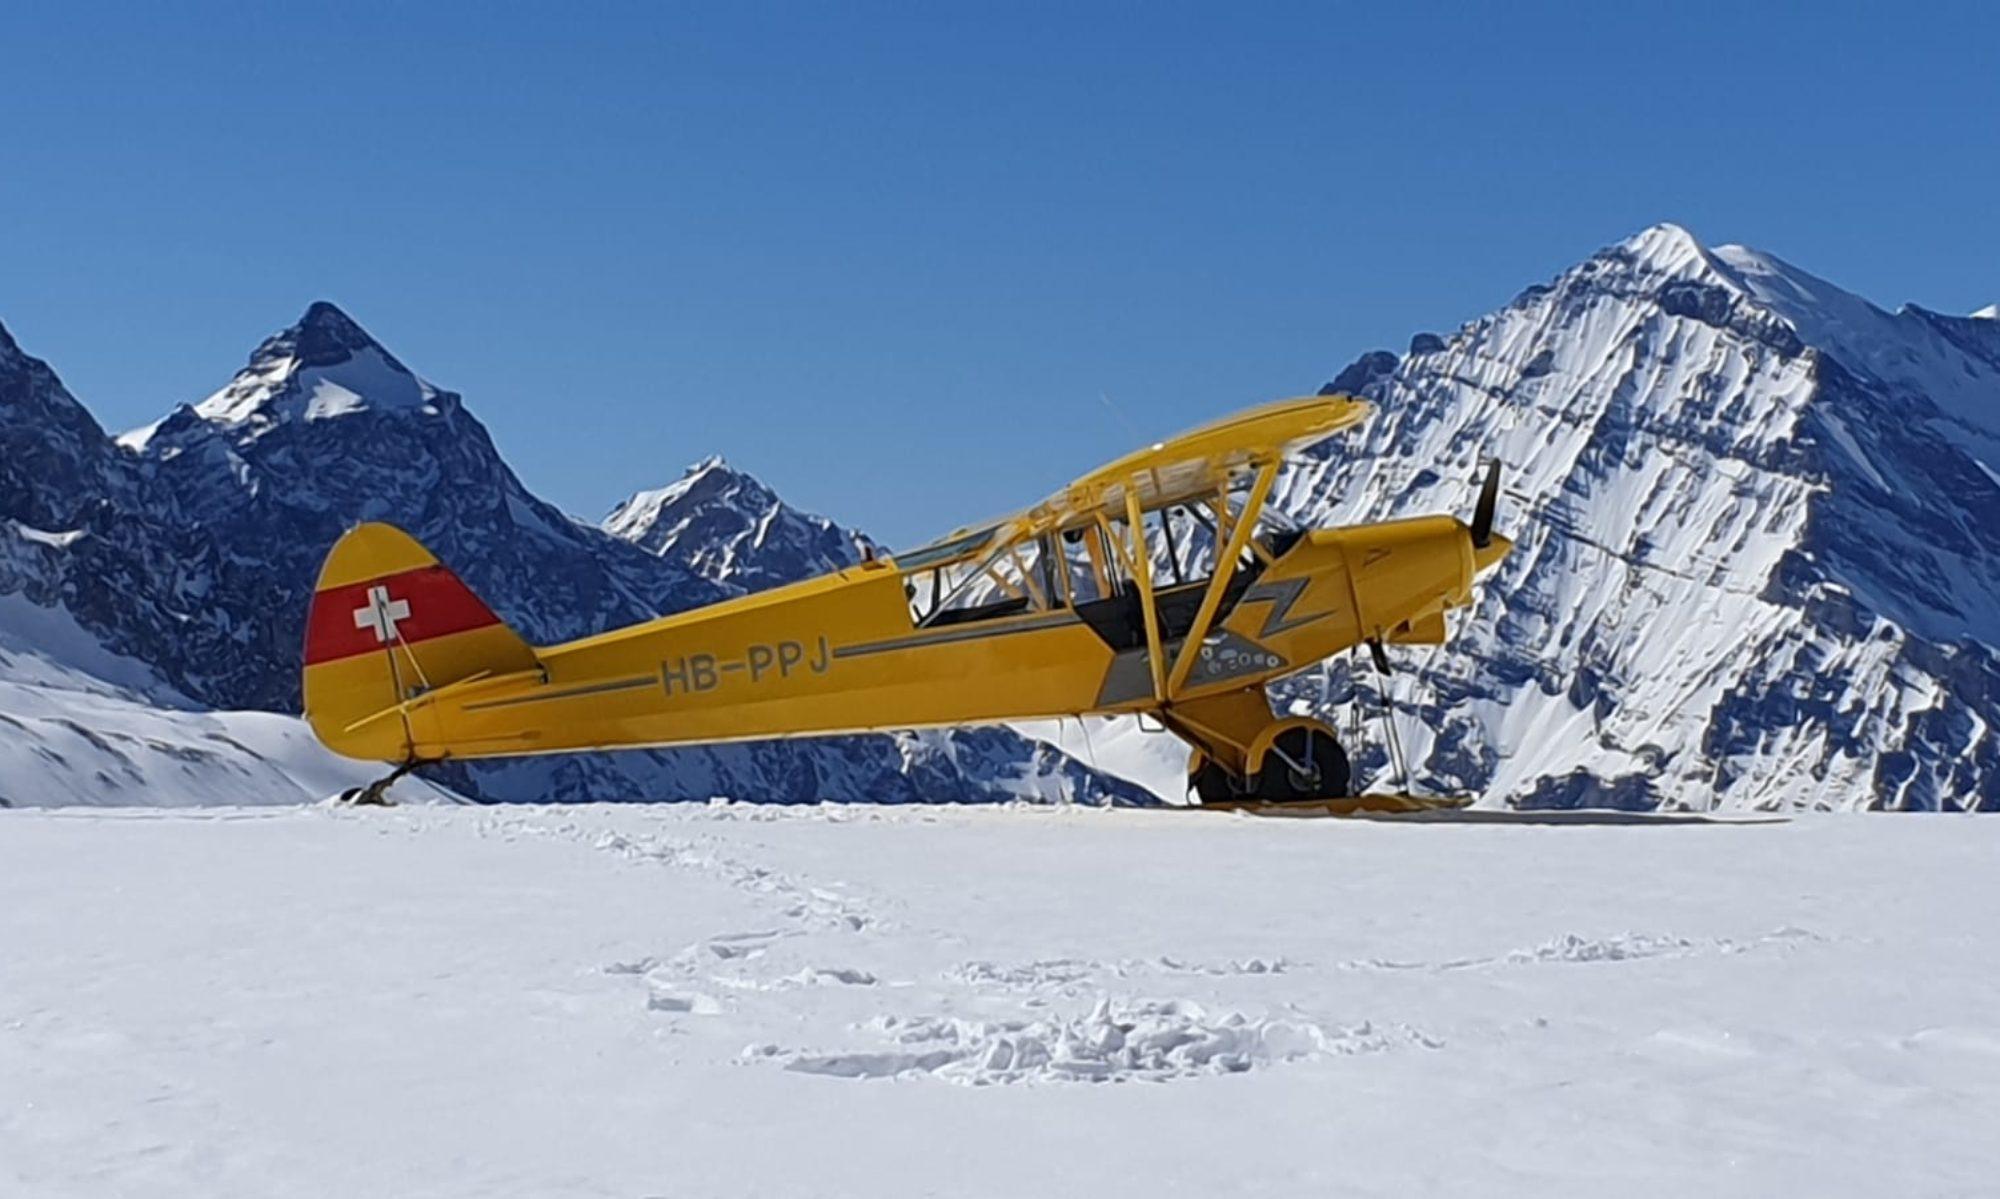 gletscherflug.ch